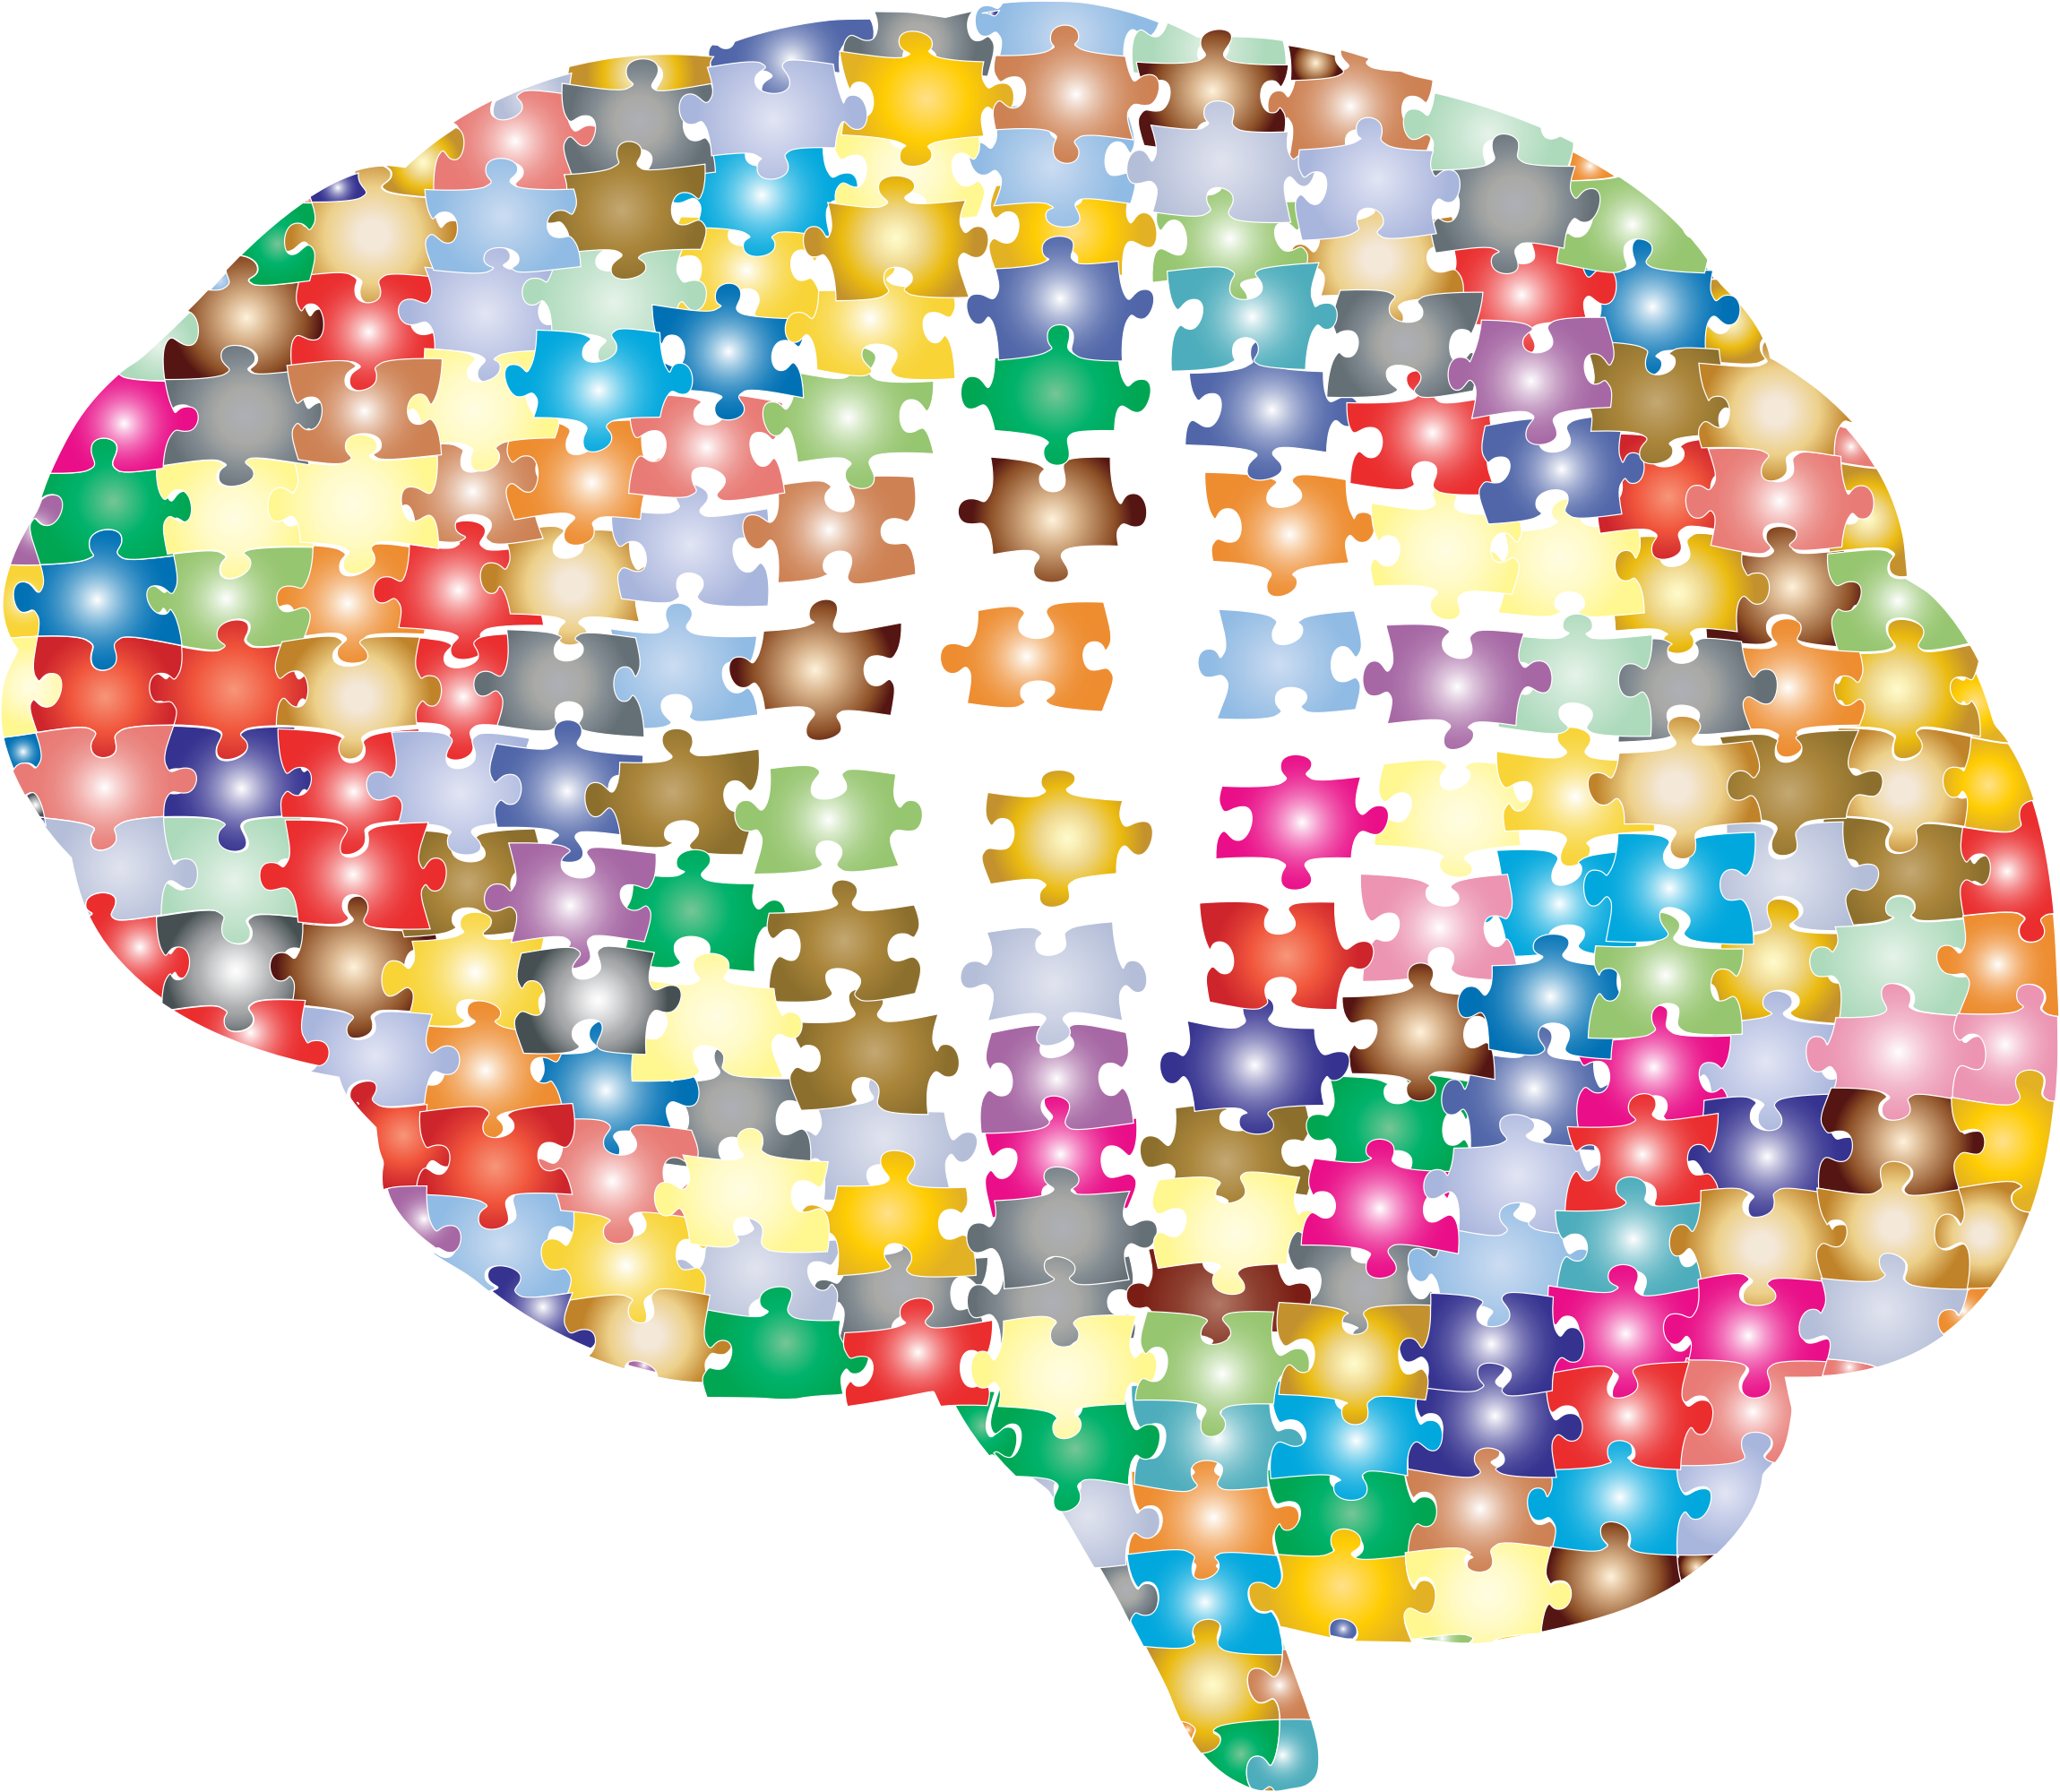 Psychology clipart puzzle head. Damaged brain jigsaw prismatic